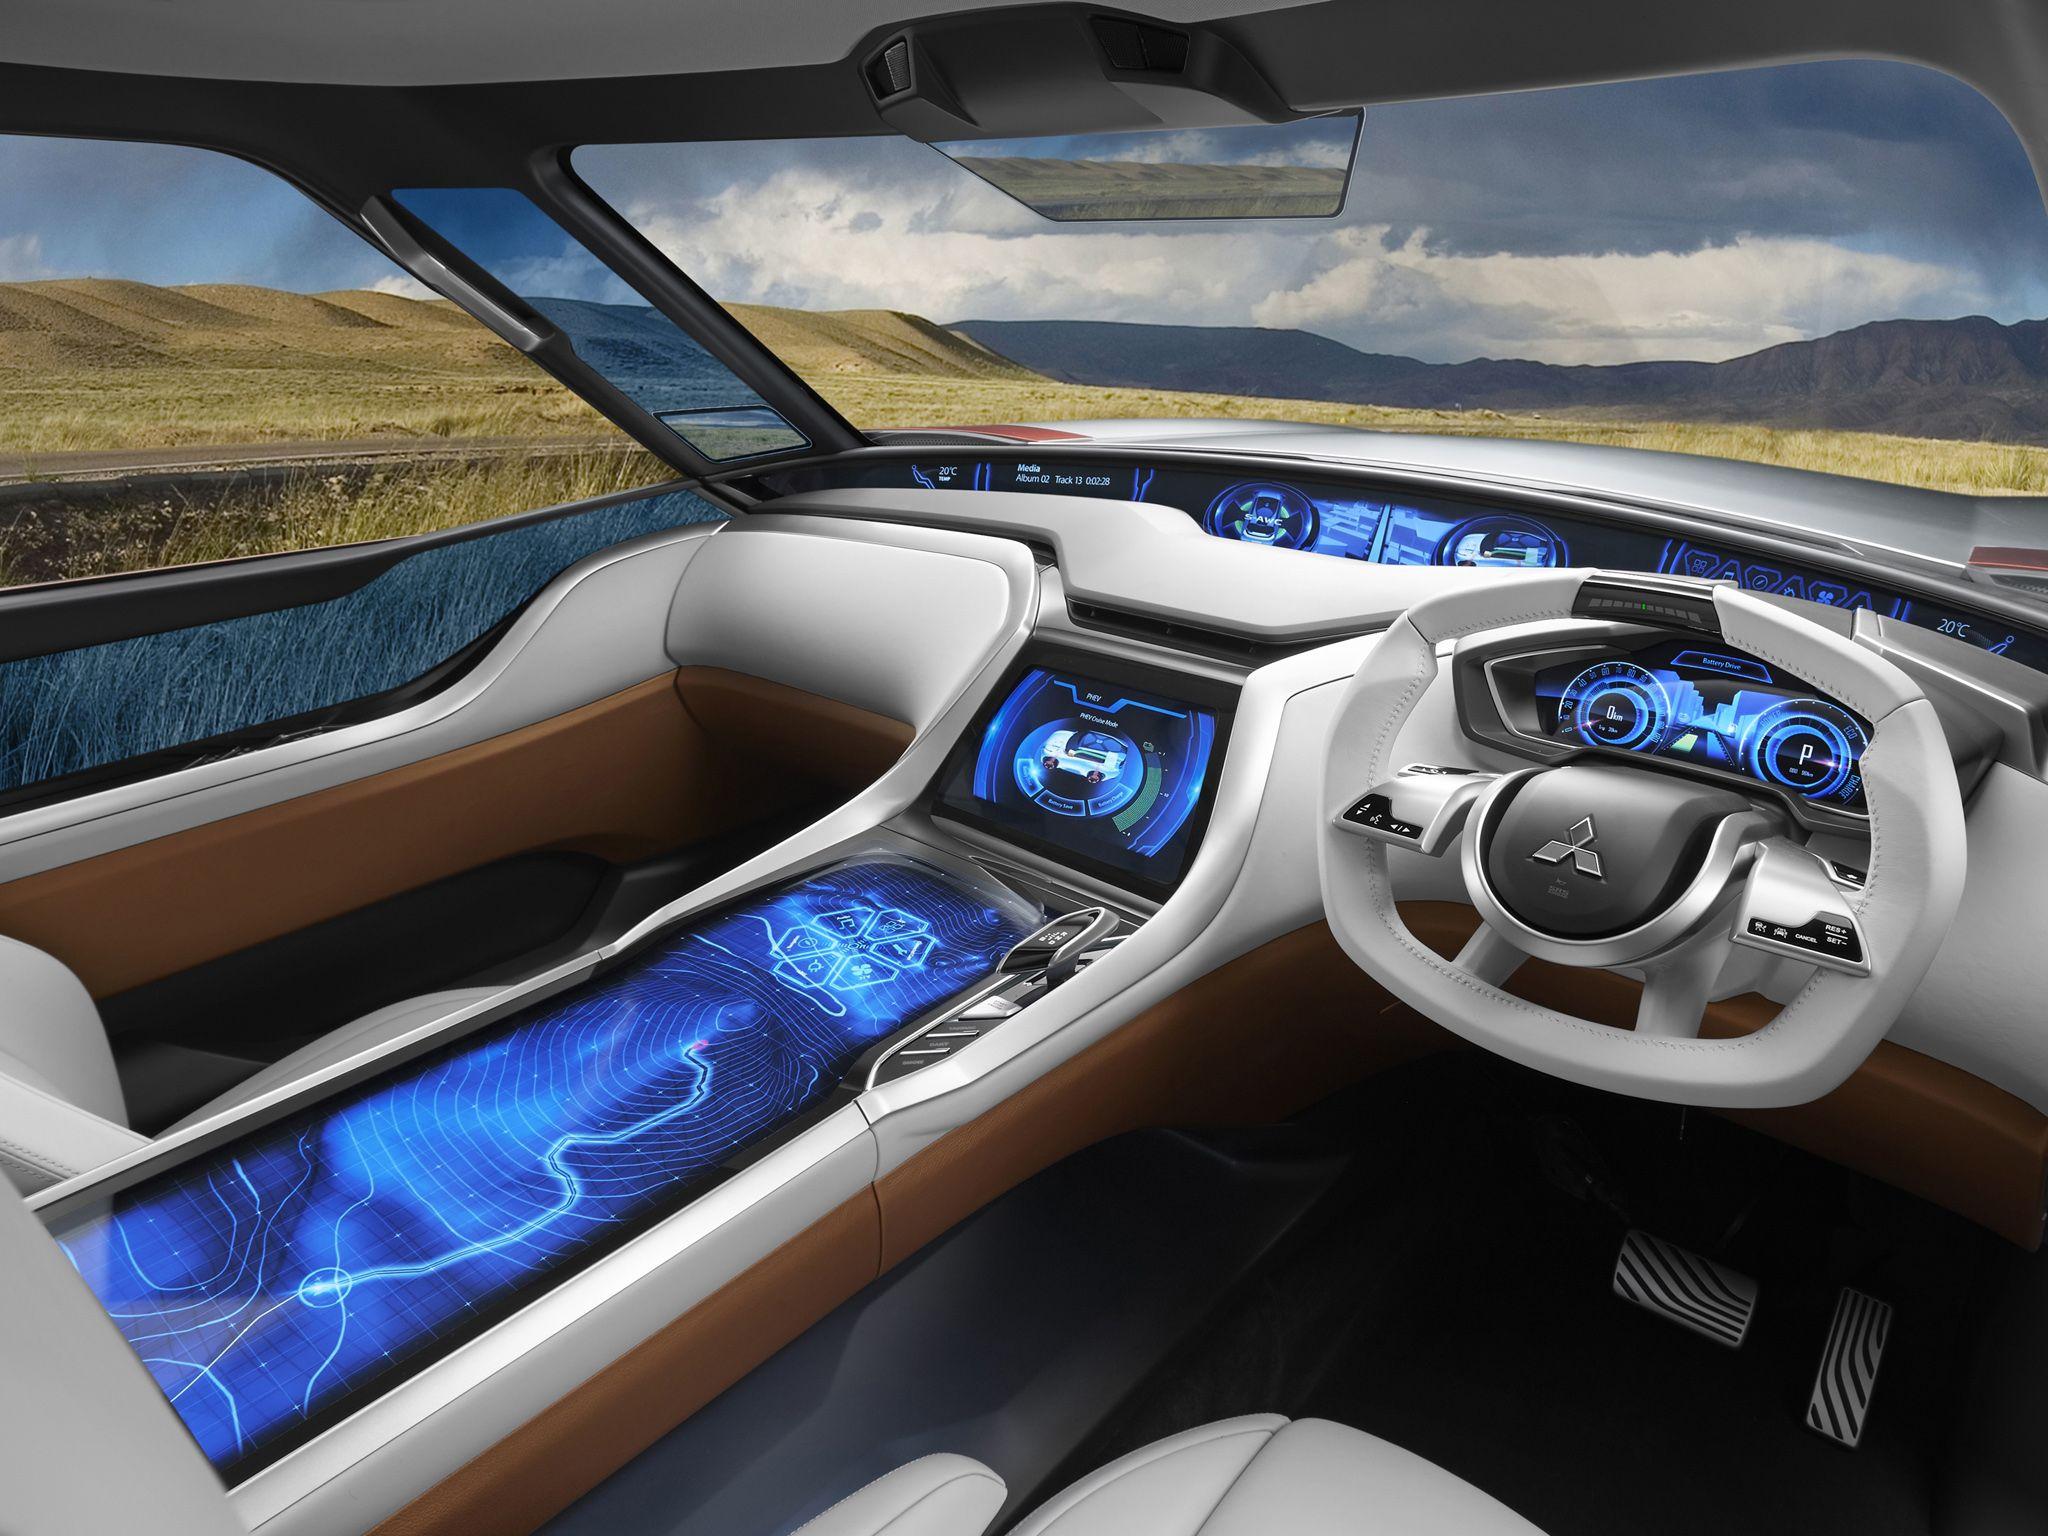 Car interior brown - Mitsubishi Phev White Brown Blue Interior Concept Tech Display Car Screen Interface Energy Interiors Pinterest Cars Blue Interiors And The O Jays